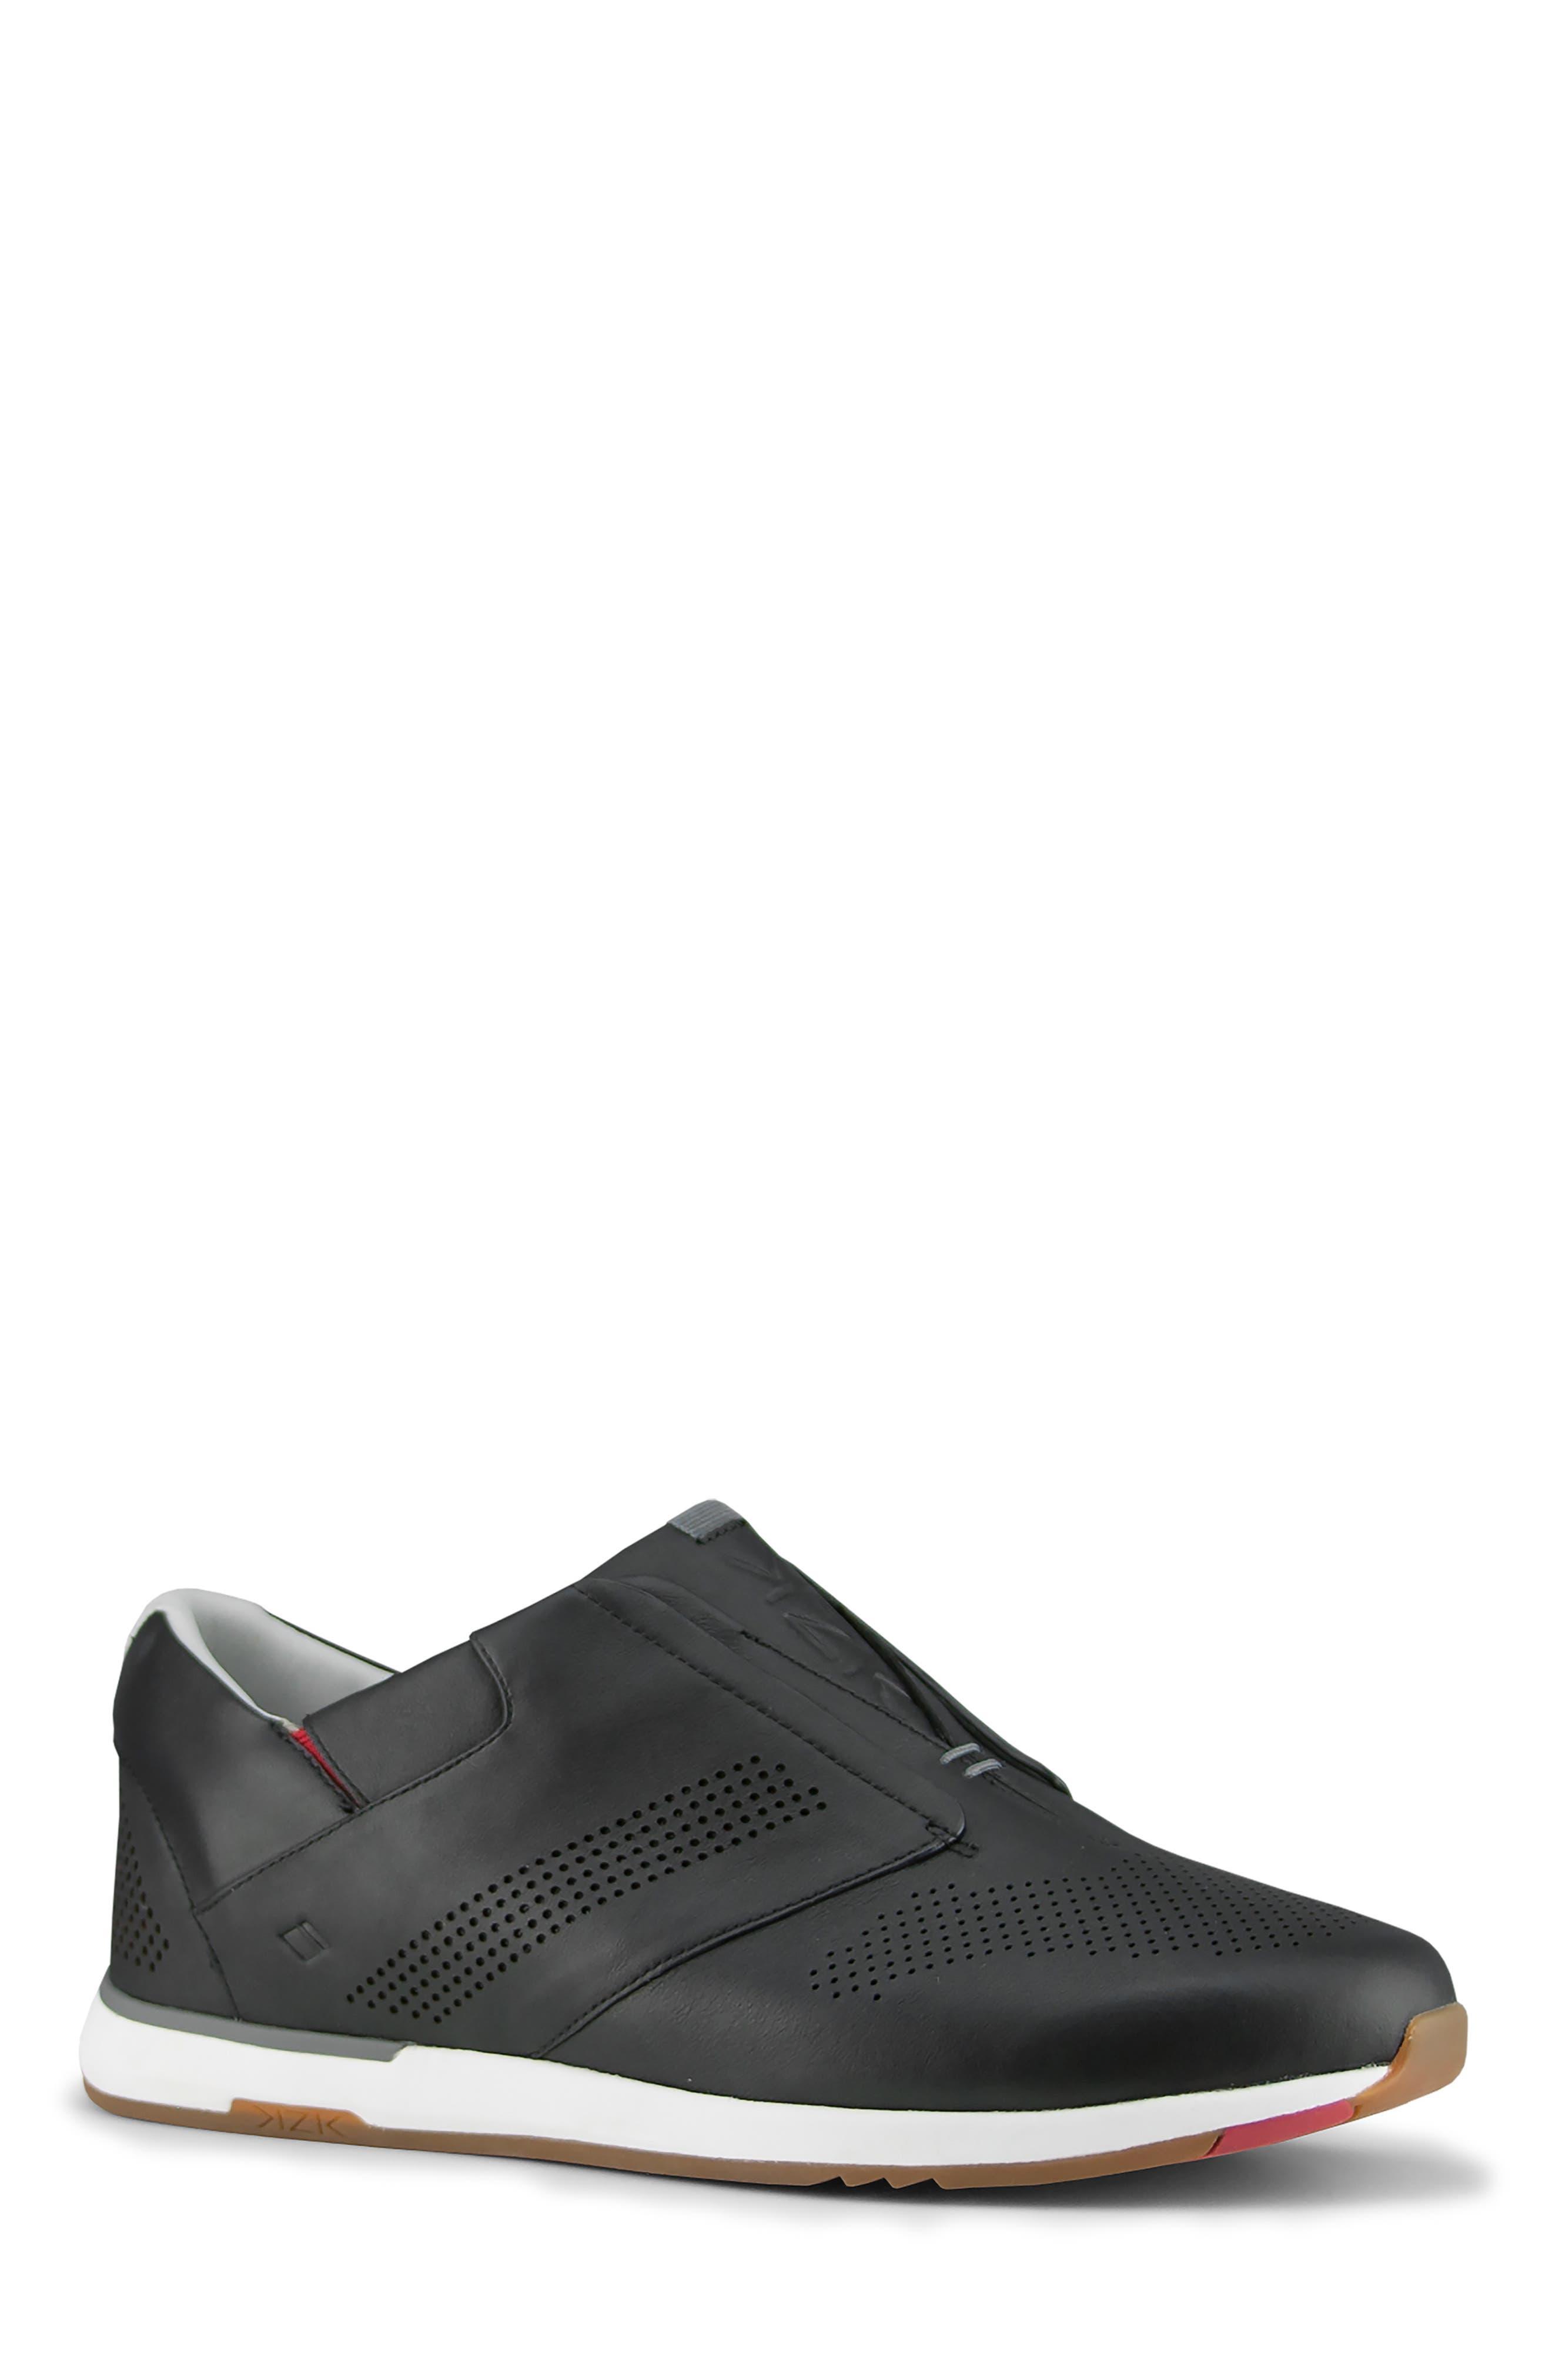 Dubai Slip-On Sneaker, Main, color, BLACK LEATHER